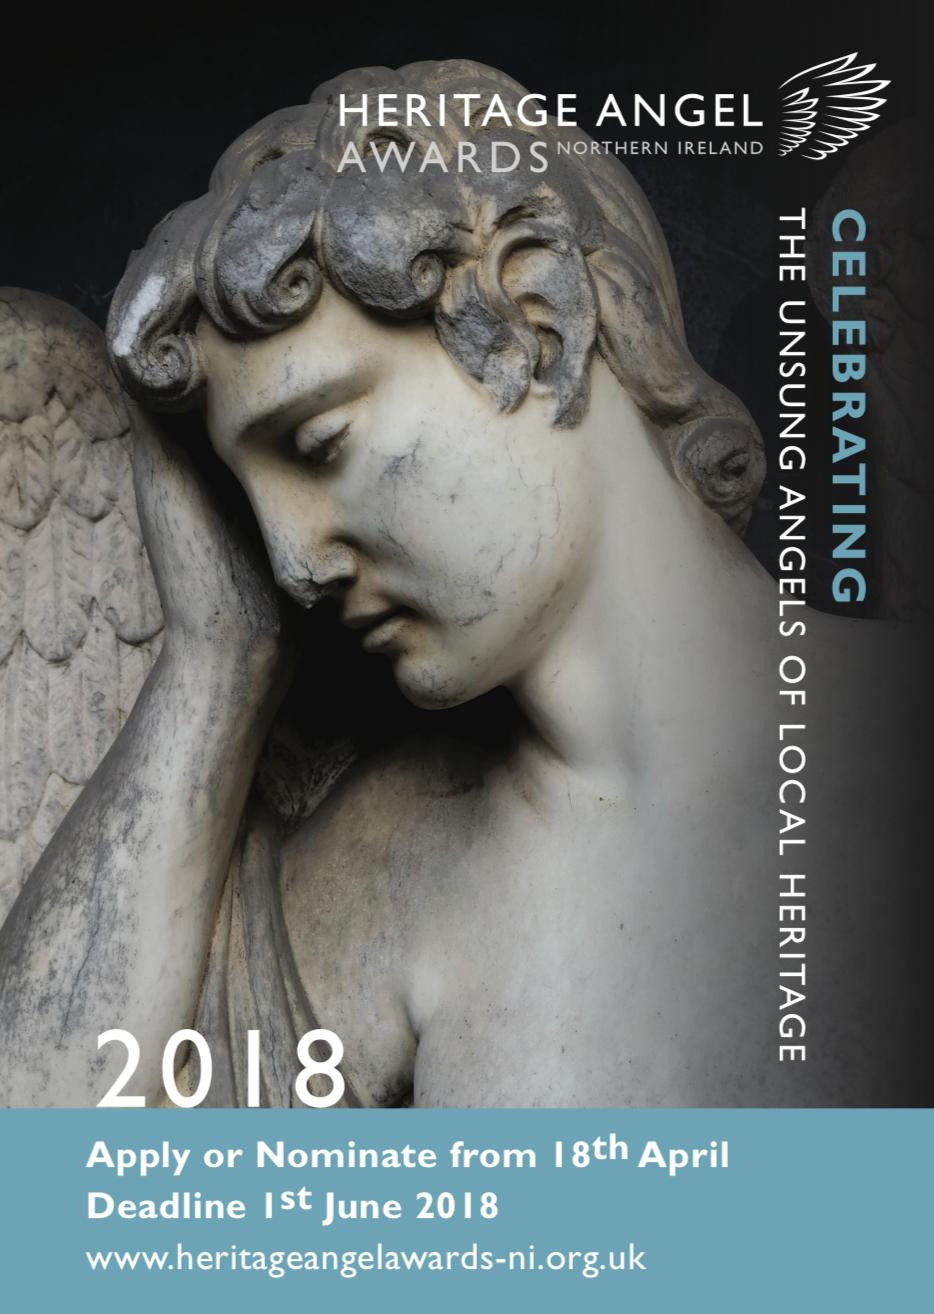 Heritage Angel Awards